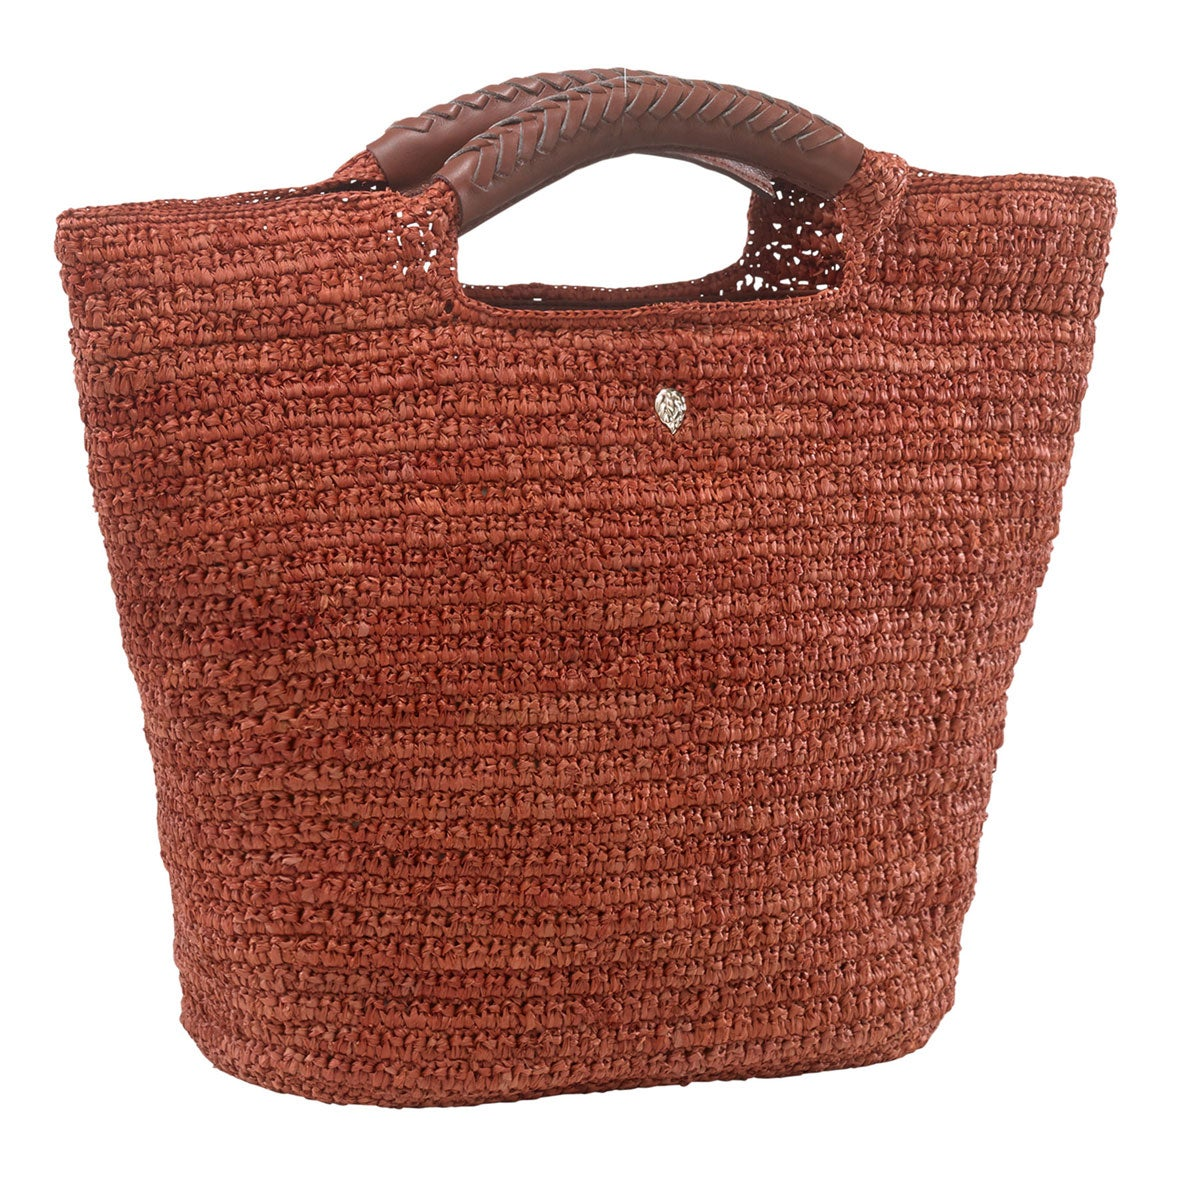 Helen Kaminski Petani Small Basket Bag in Spice,Lavana